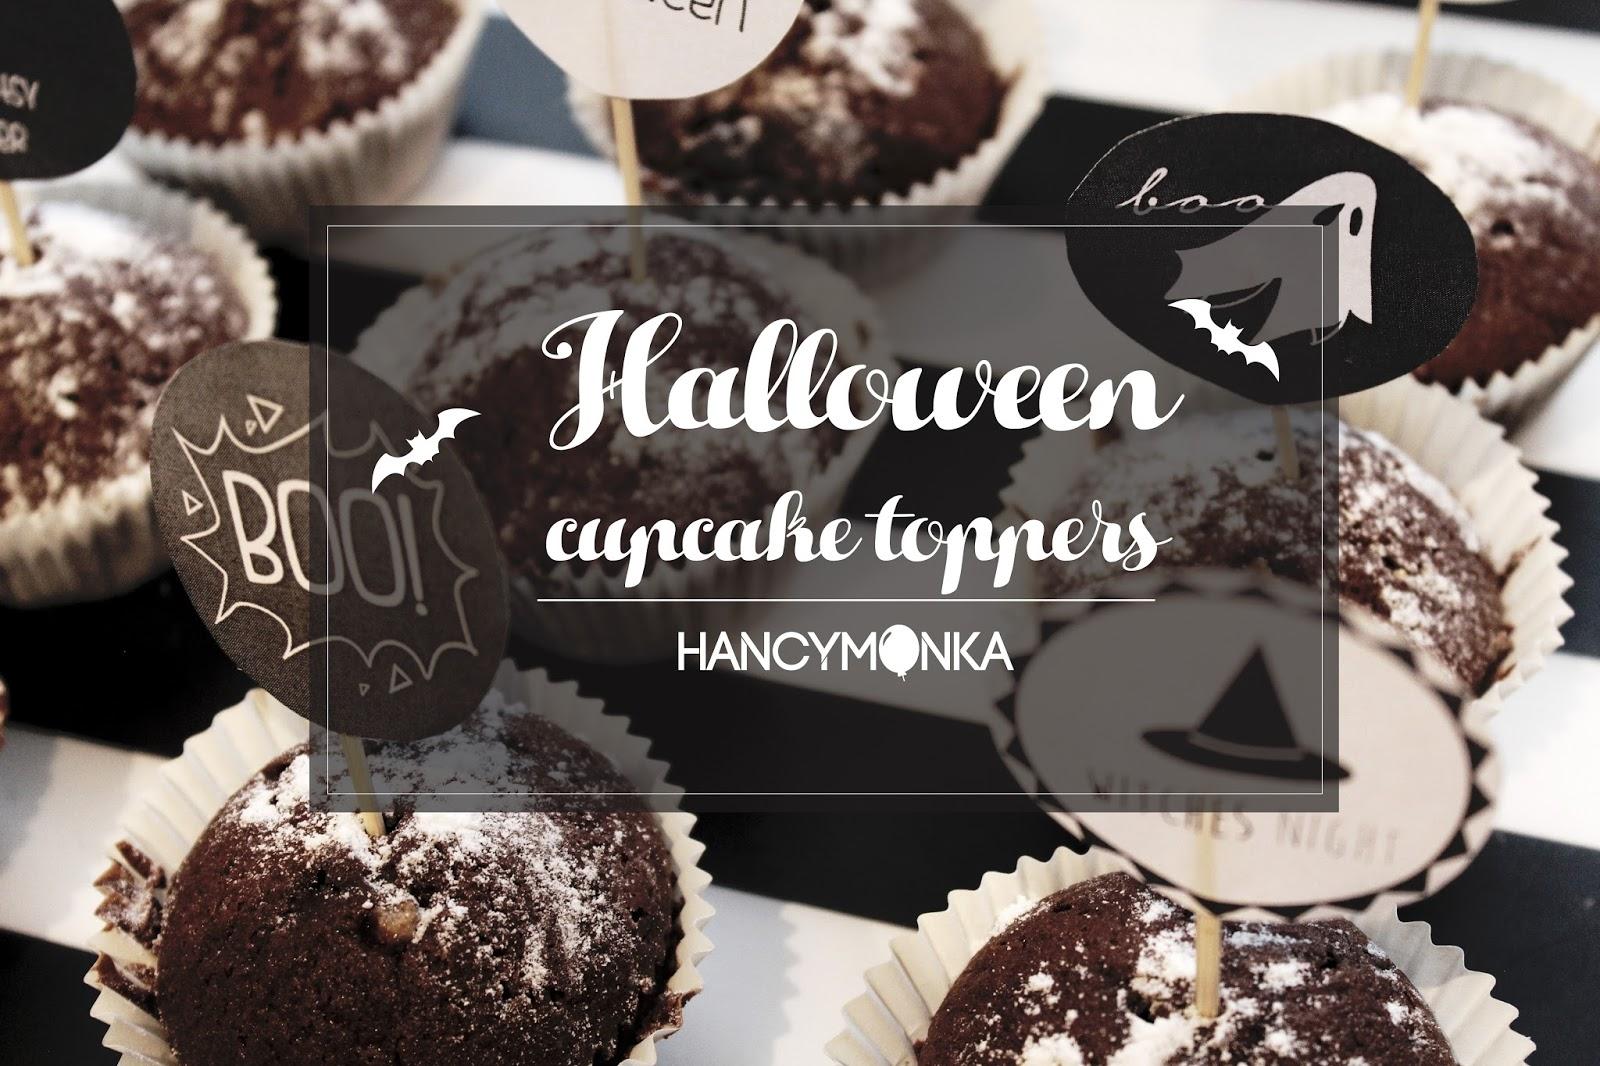 blog, hancymonka, cupcake, cupcakes, cake toppers, toppers, cupcake toppers, grafika, darmowe grafiki, design, projekty, freebies, diy, zrób to sam, parenting, halloween